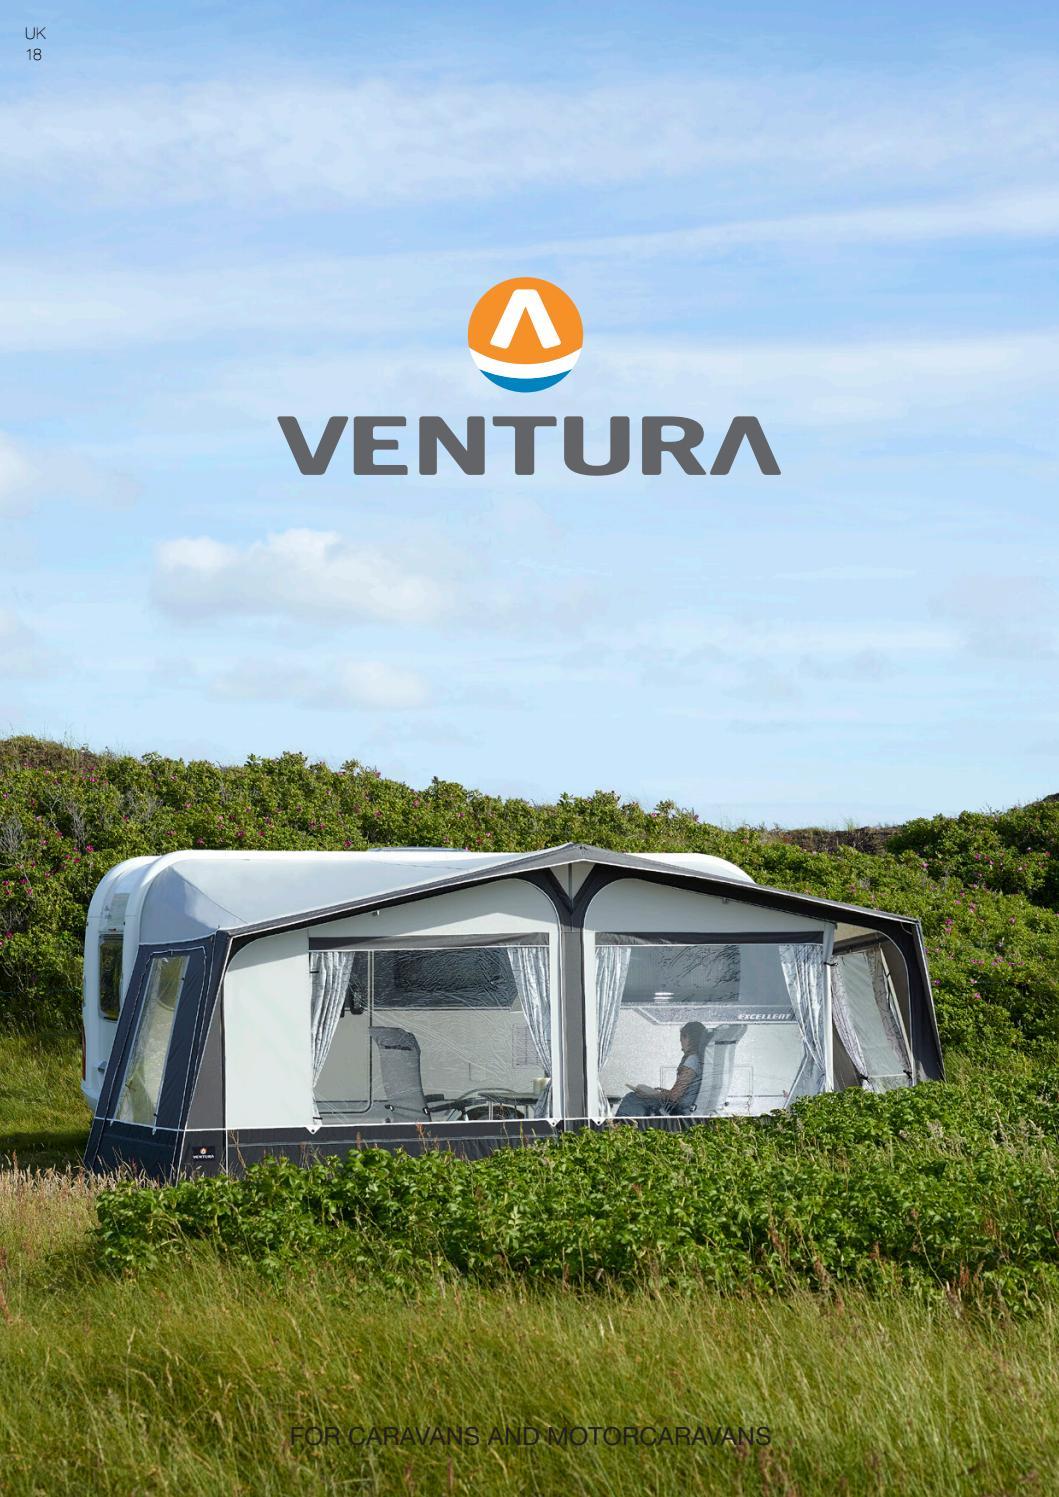 Ventura Brochure Catalog 2018 Uk By Ventura Camping Issuu